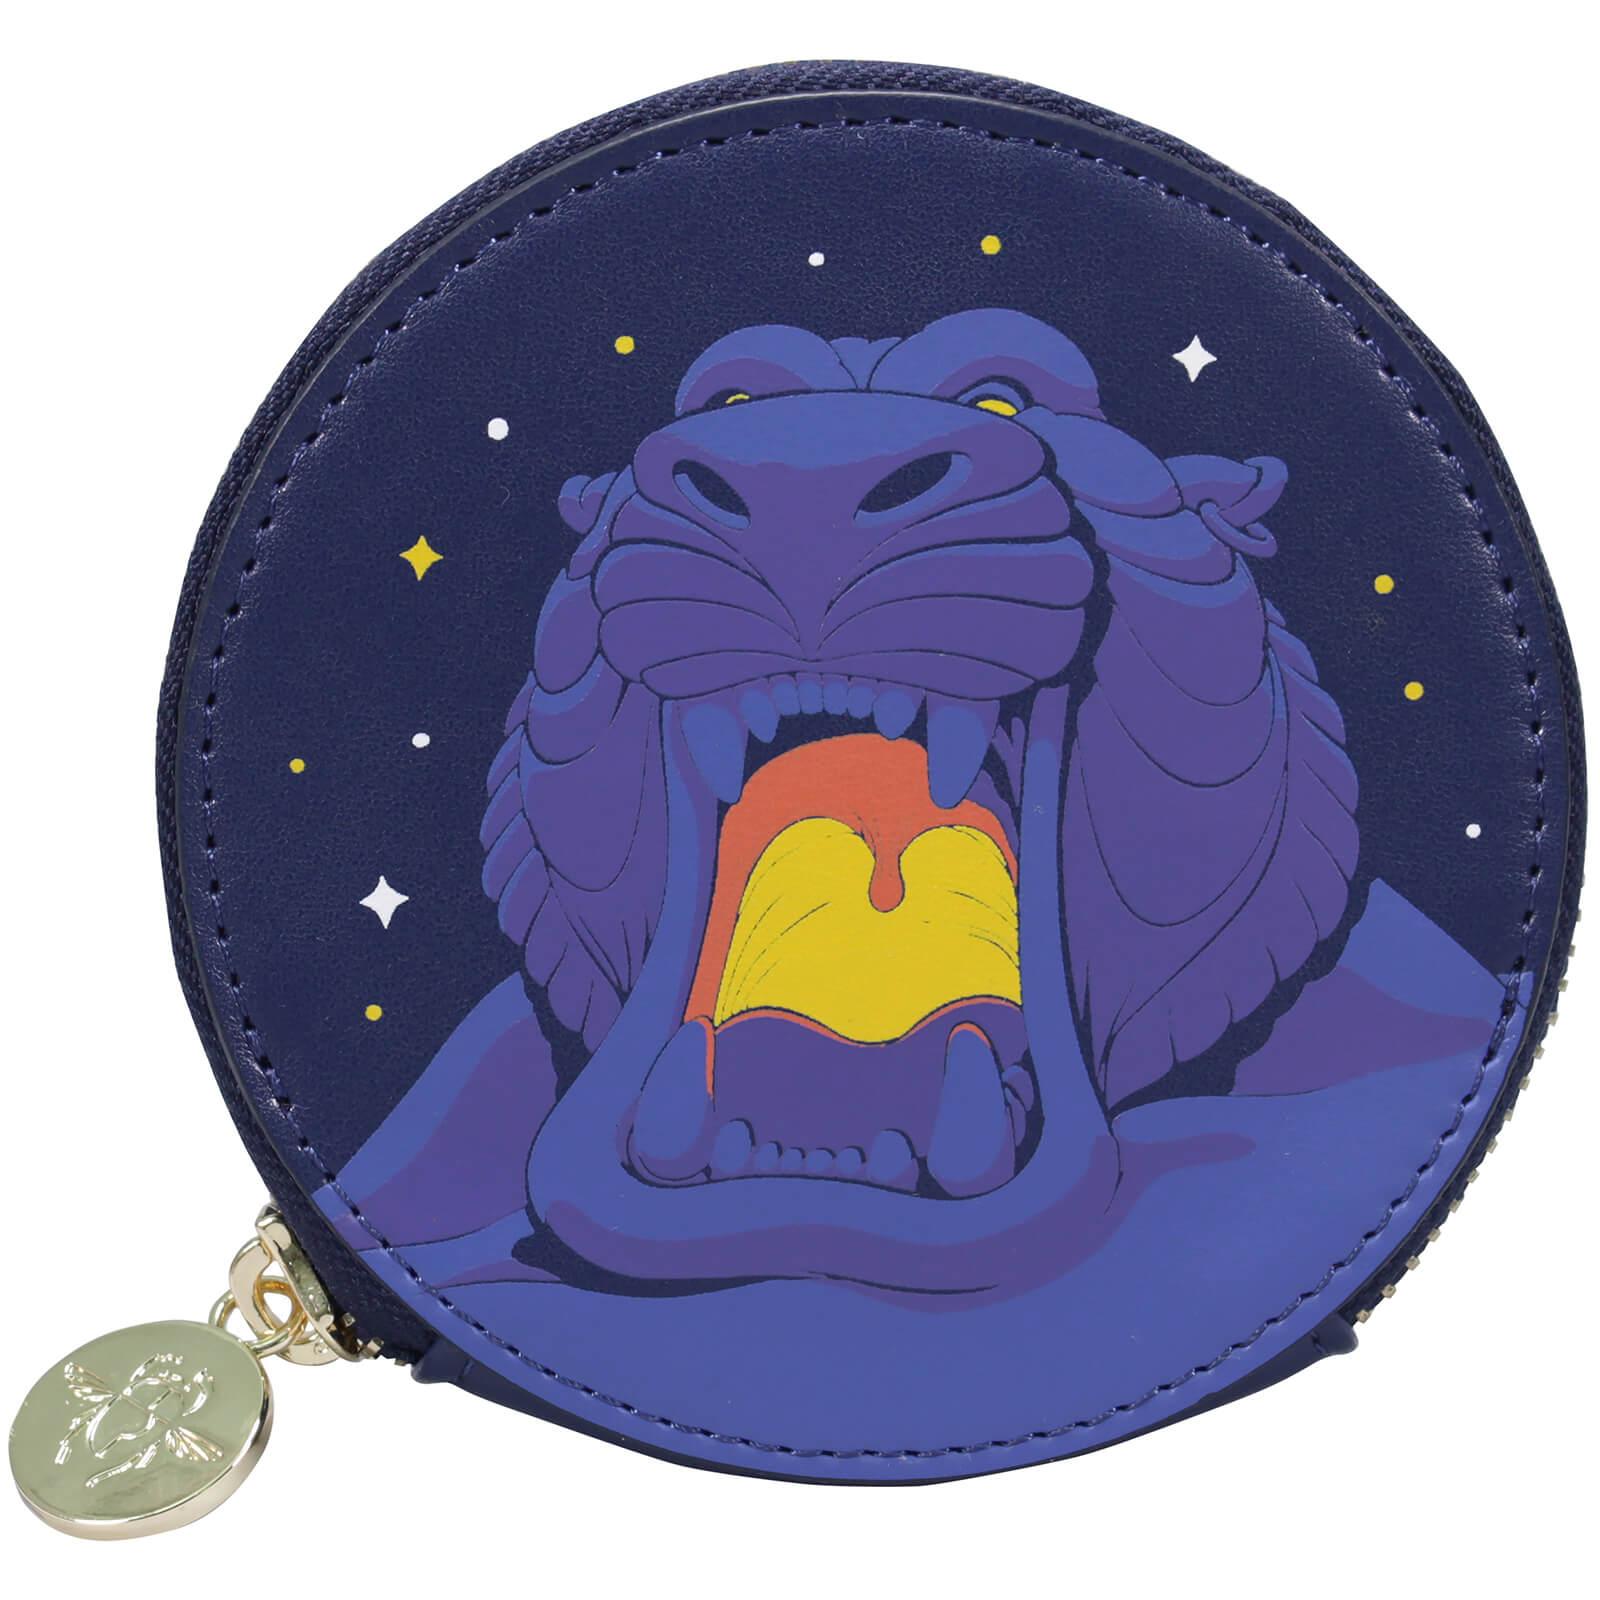 Image of Aladdin Coin Purse